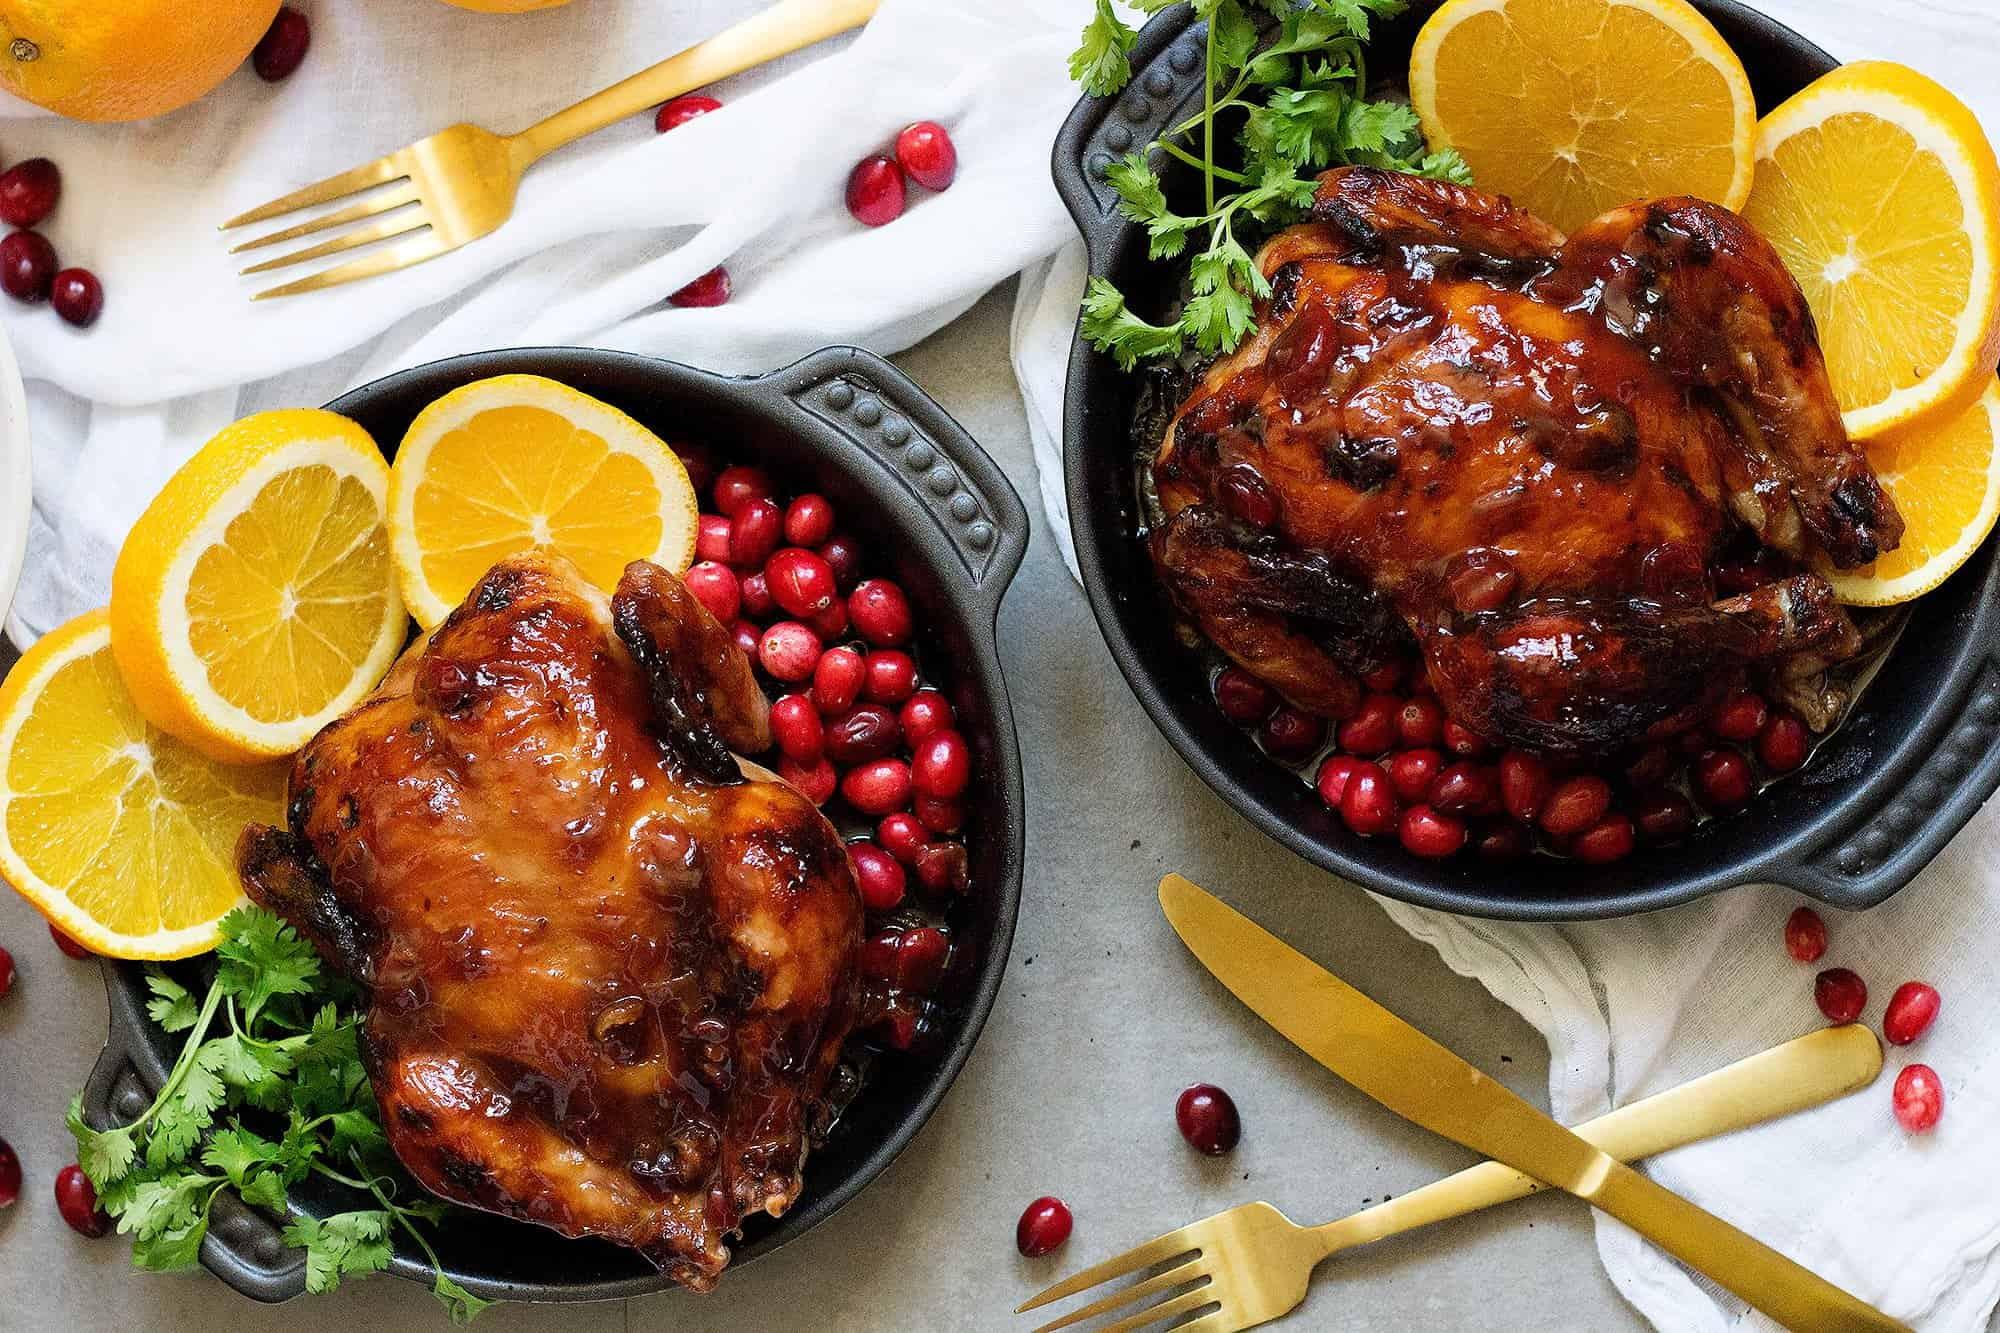 cornish chicken recipe is made with an orange cranberry glaze